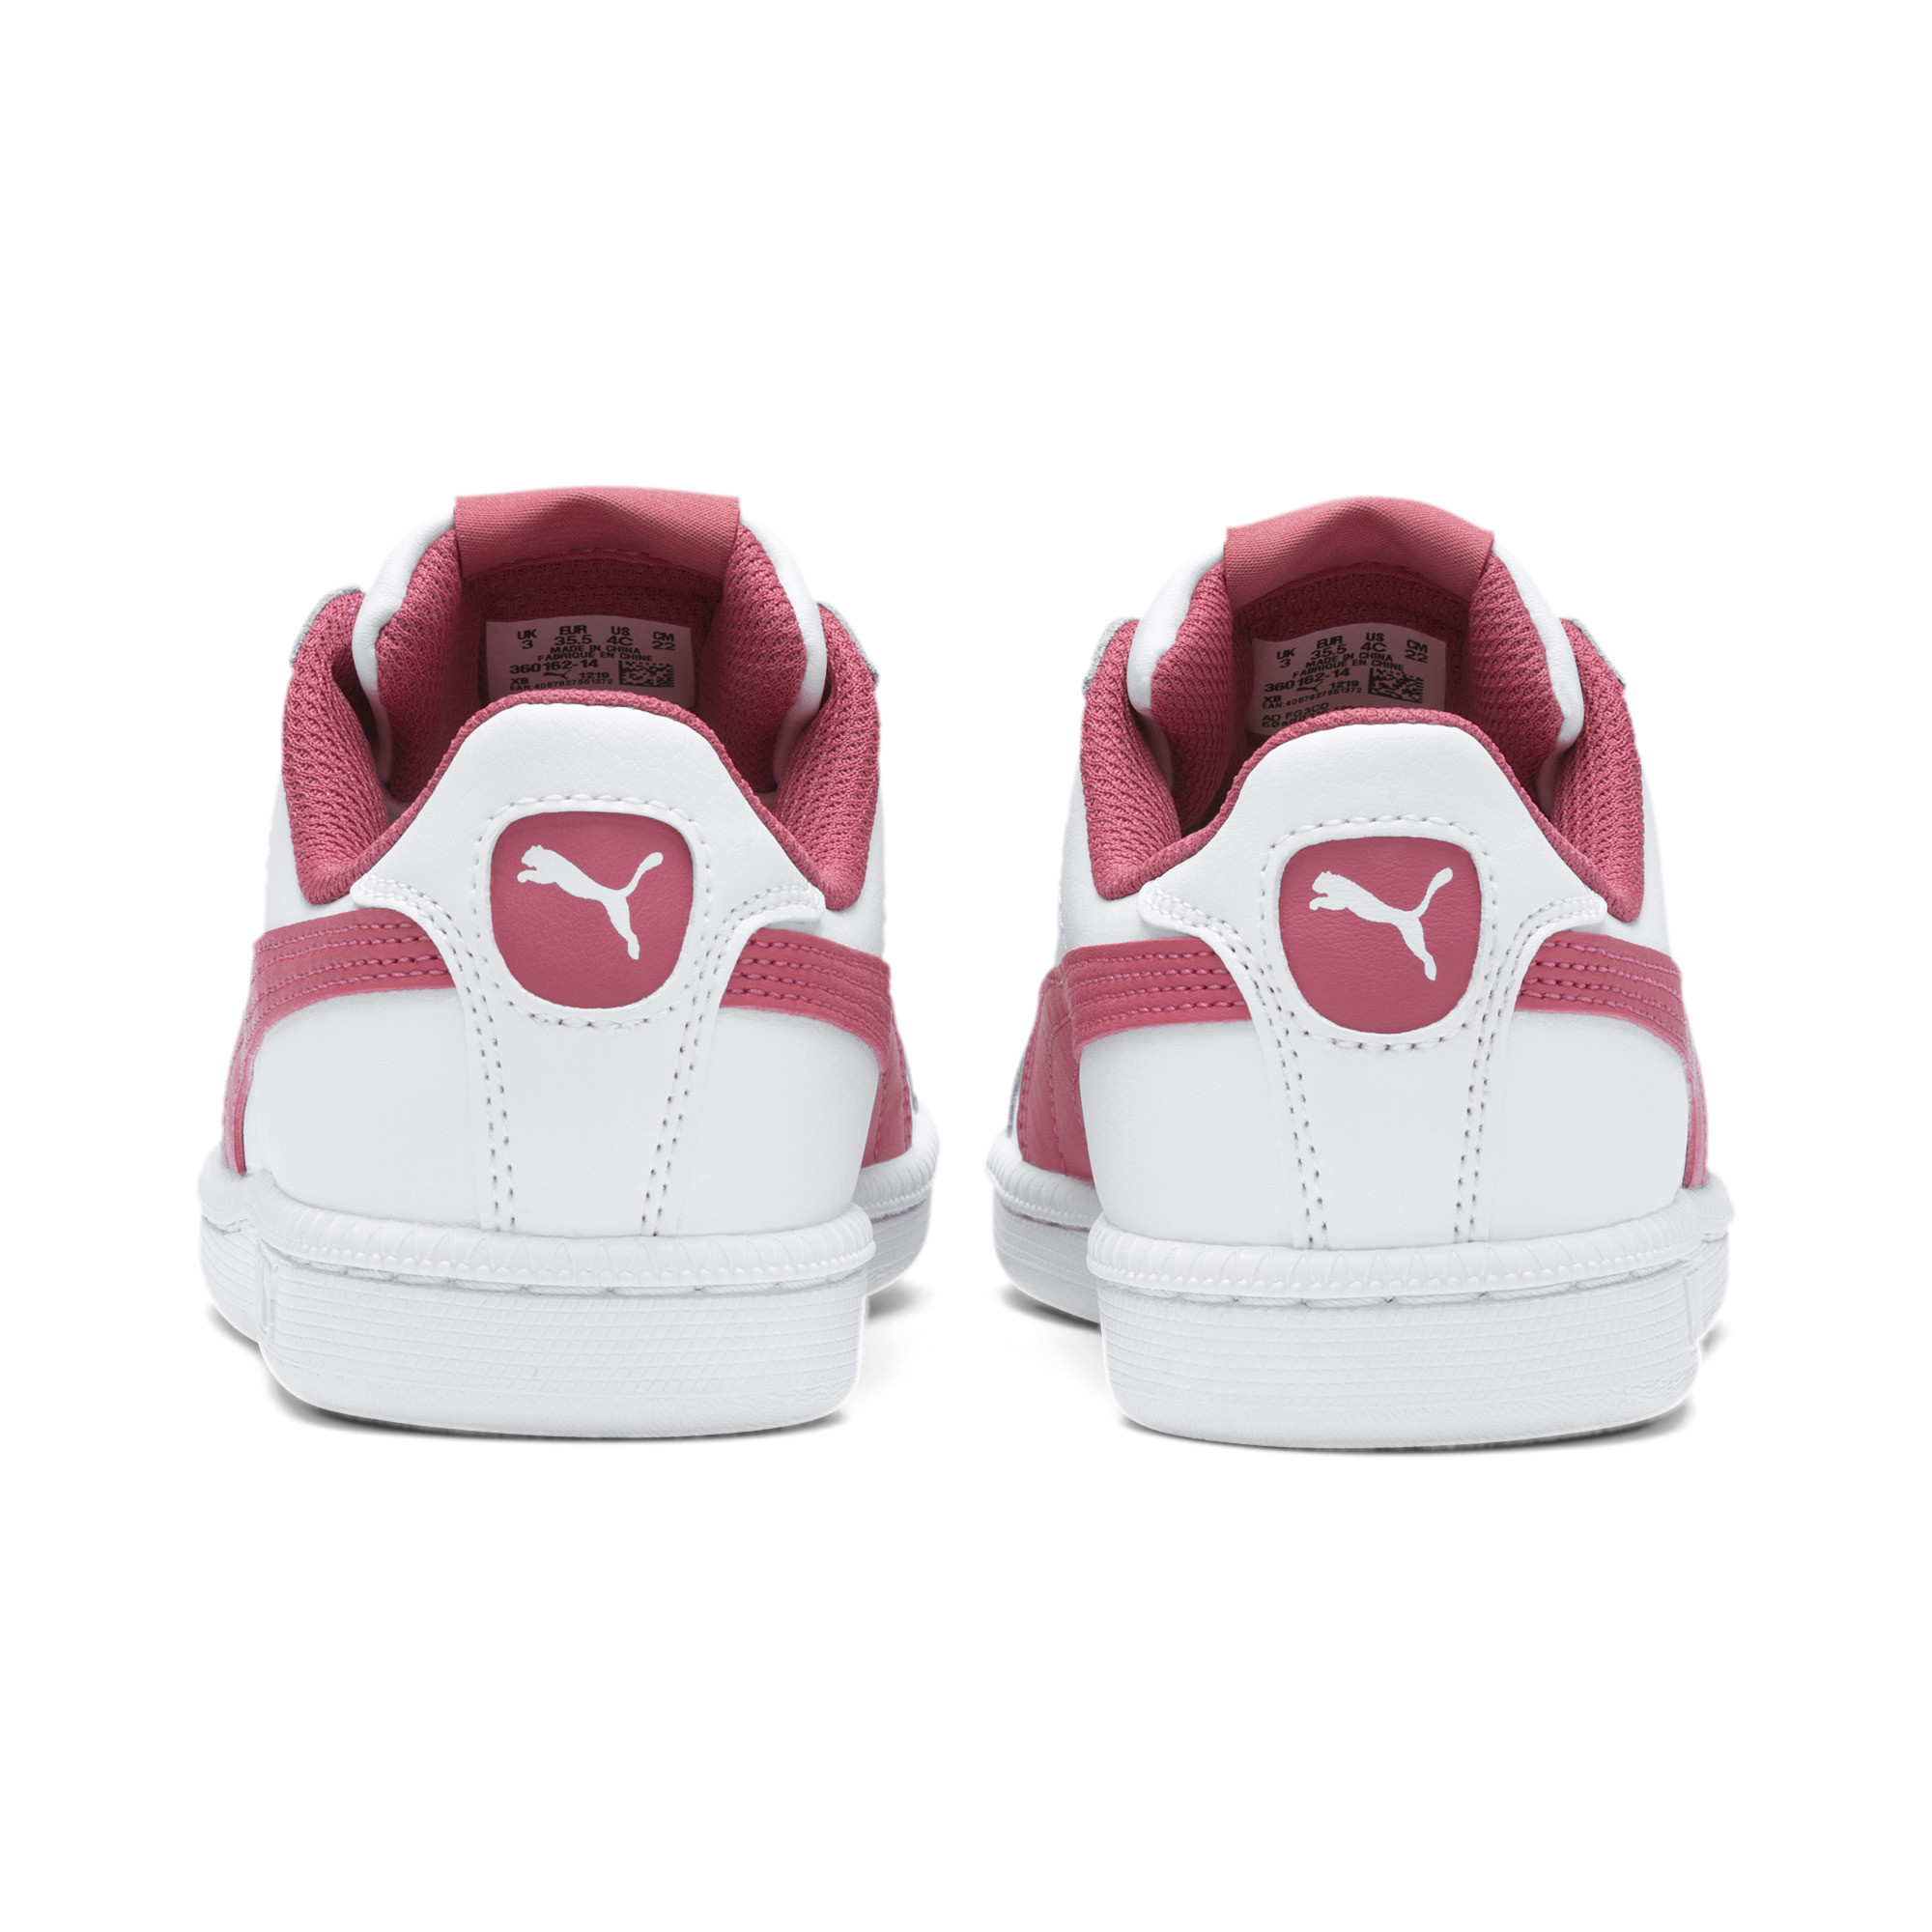 PUMA-Smash-Jr-Sneaker-Unisex-Schuhe-Kinder-Neu Indexbild 18